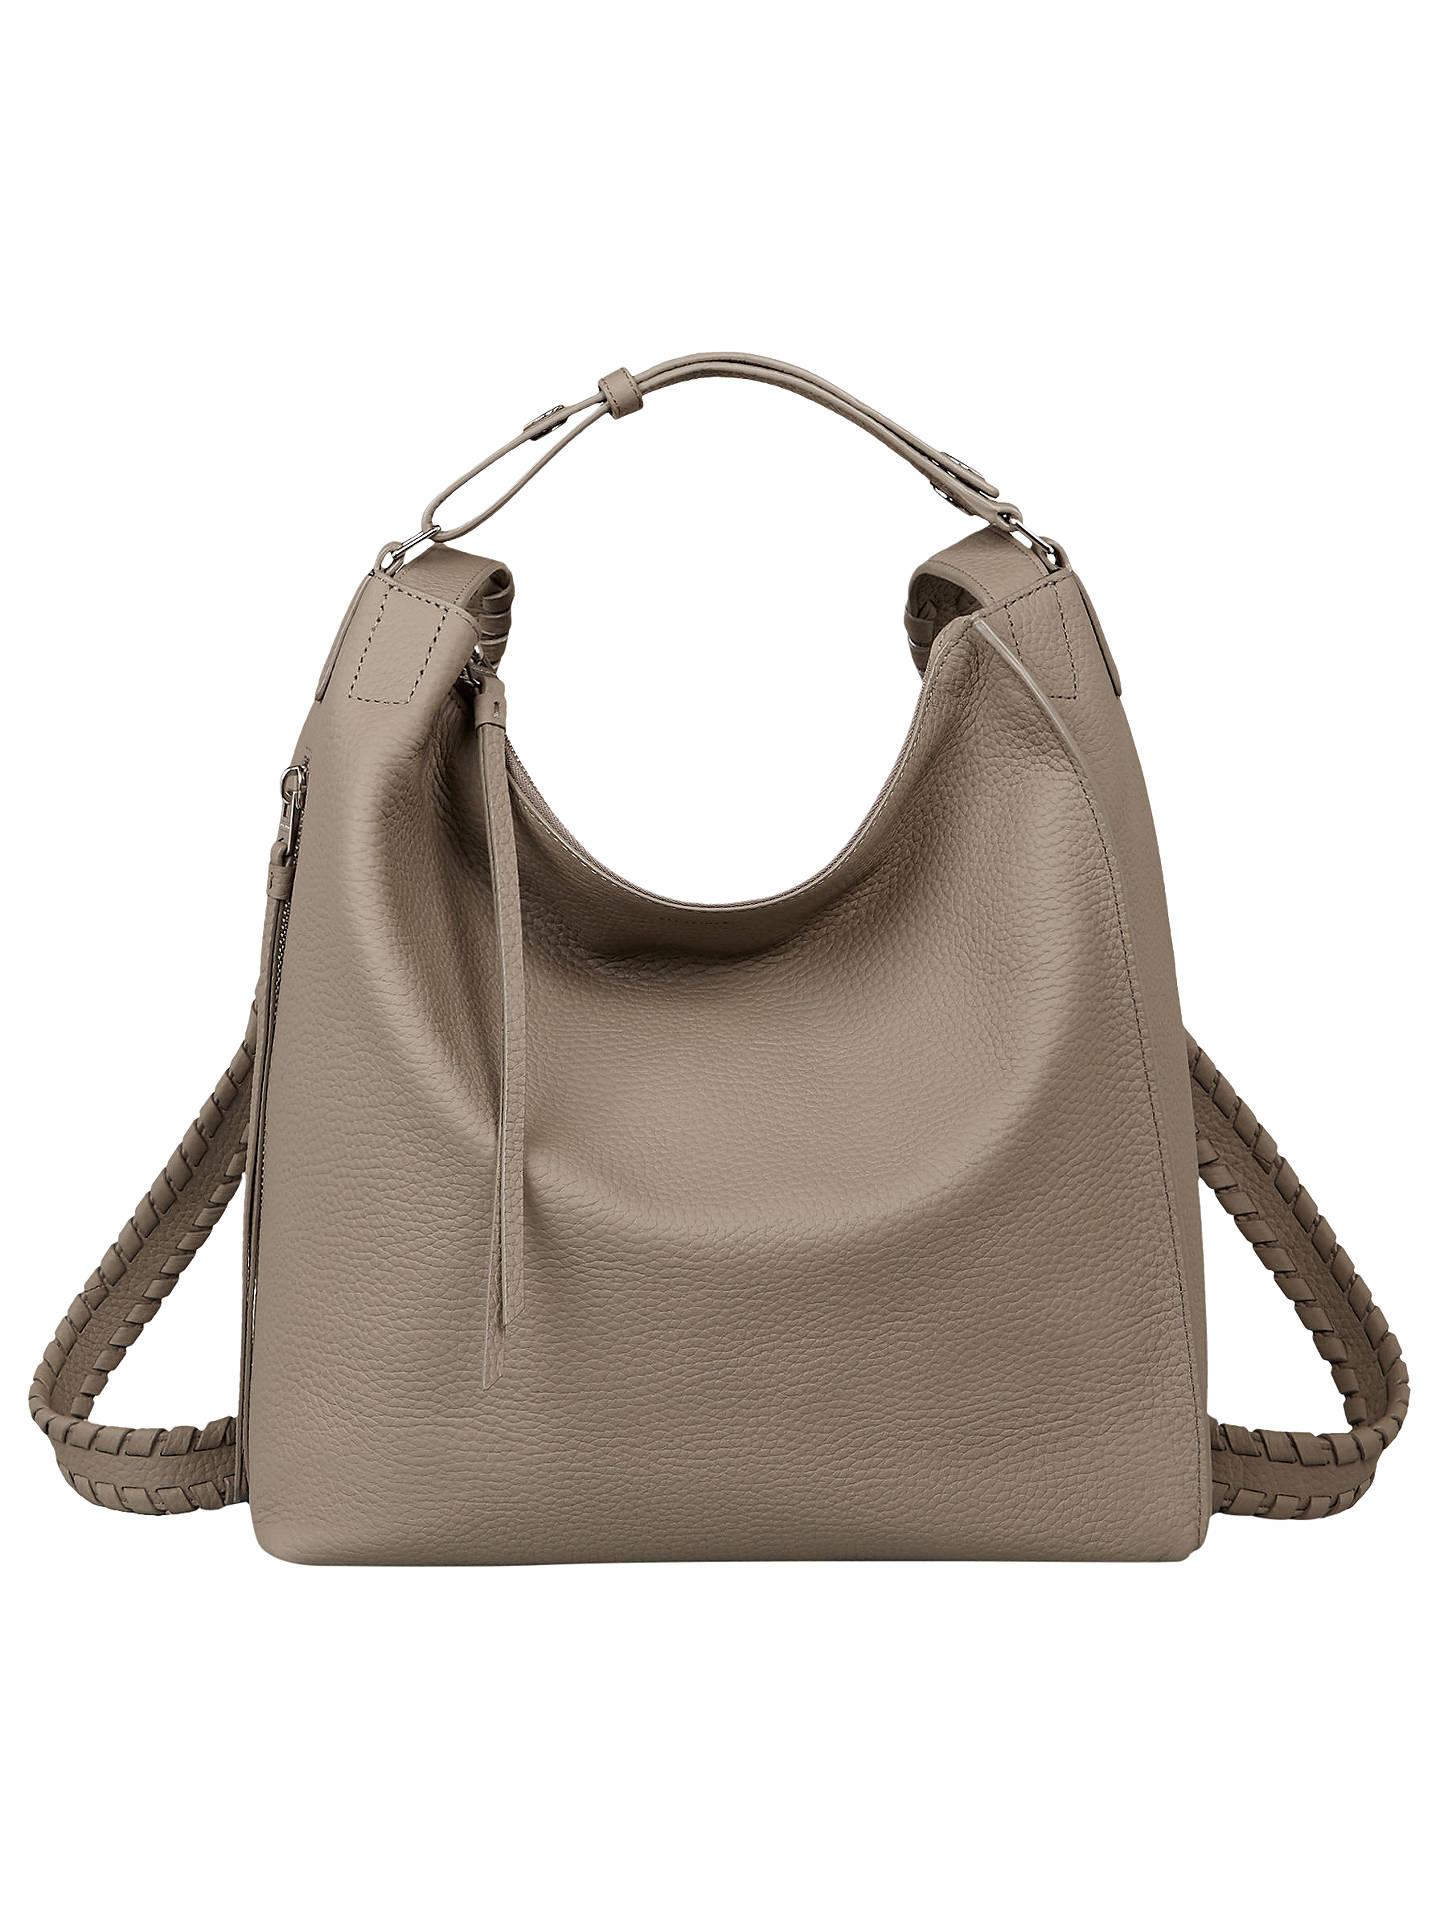 fbd99a55d58 Buy AllSaints Small Kita Backpack